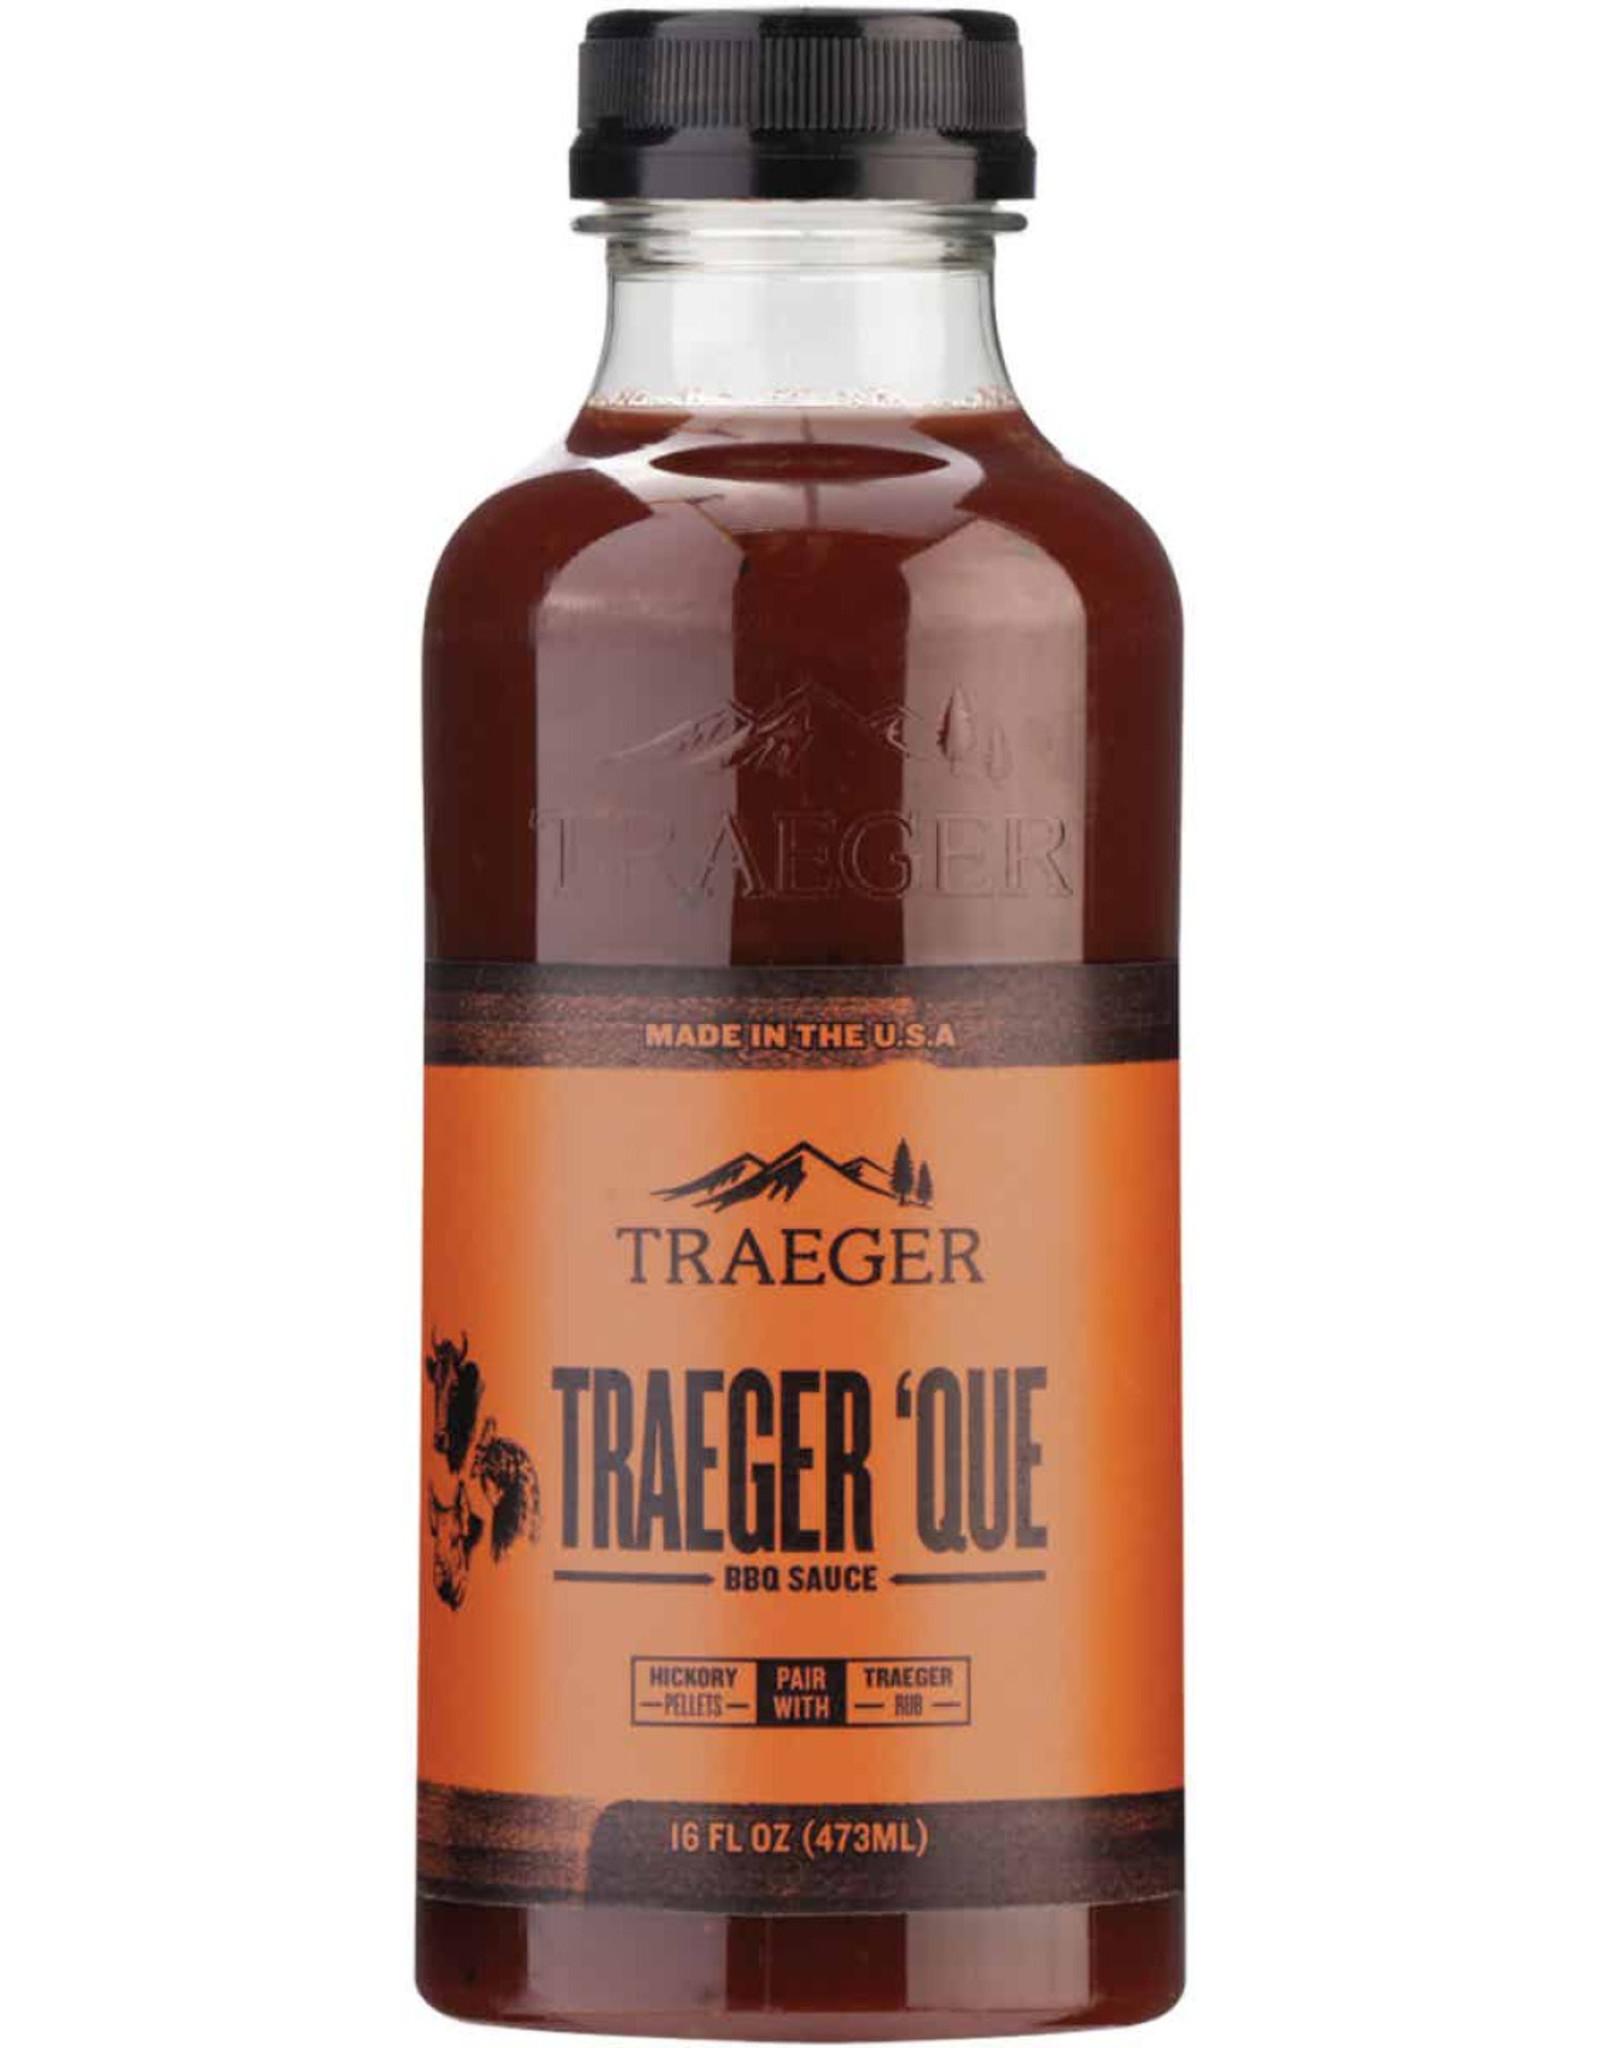 Traeger Traeger 'Que BBQ Sauce - SAU039